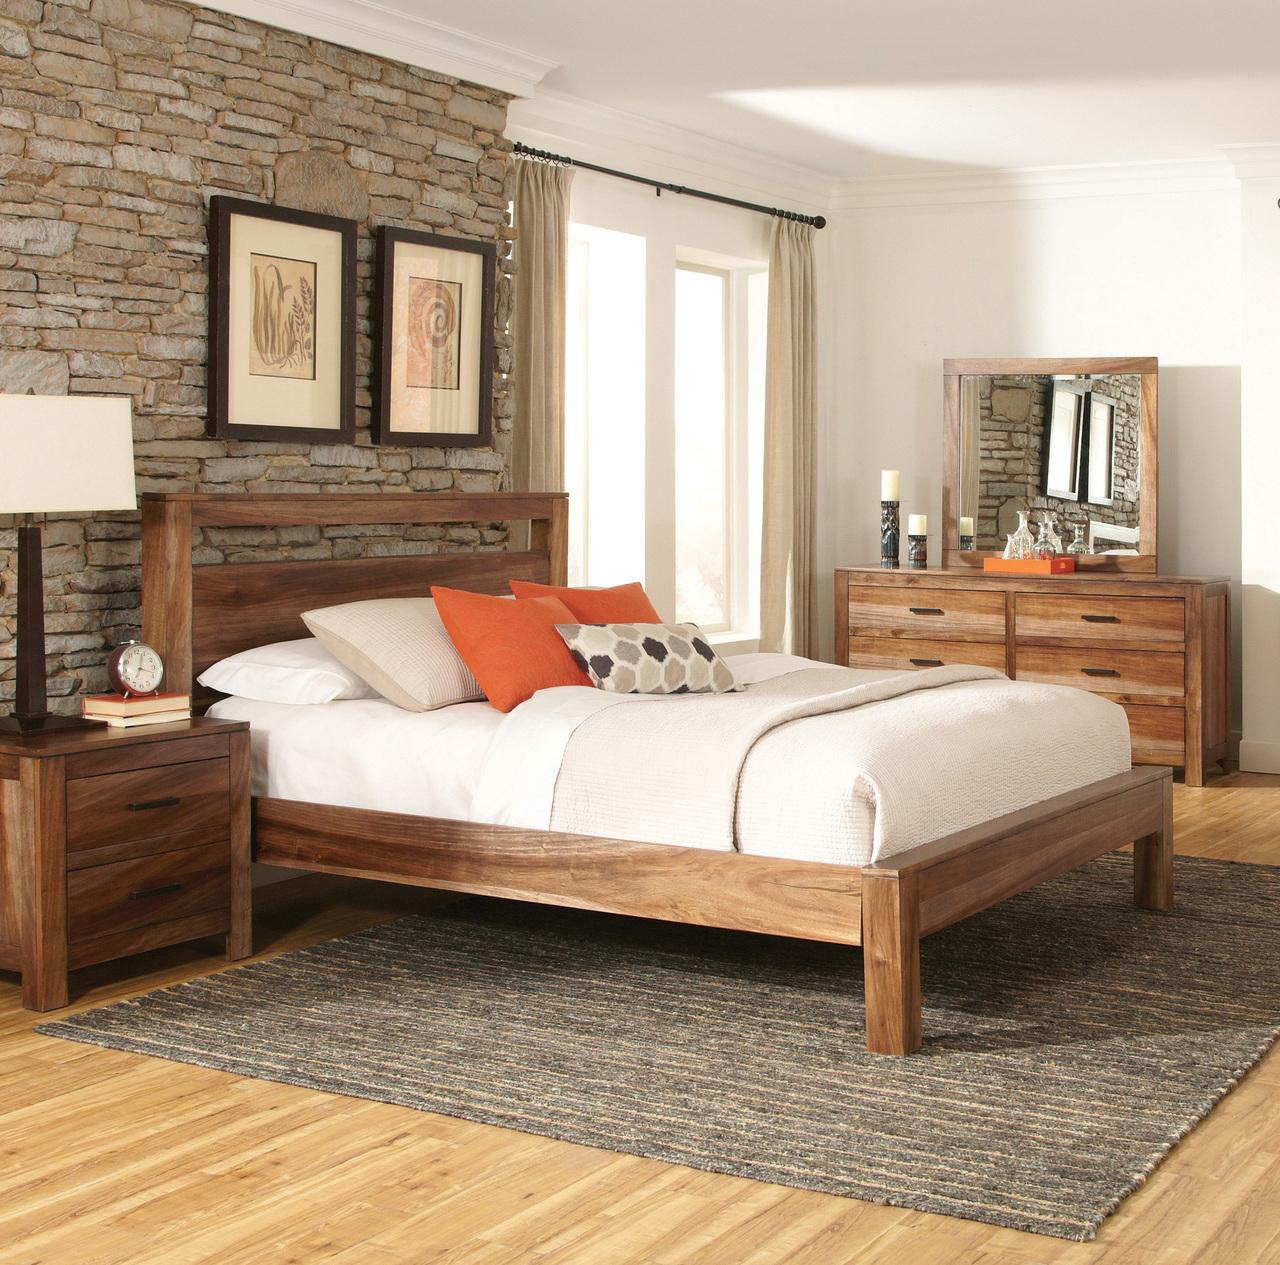 Rustic Mansion Bedroom Set Rustic Bedroom Set Rustic: 10 Great Platform Beds For Any Bedroom Style